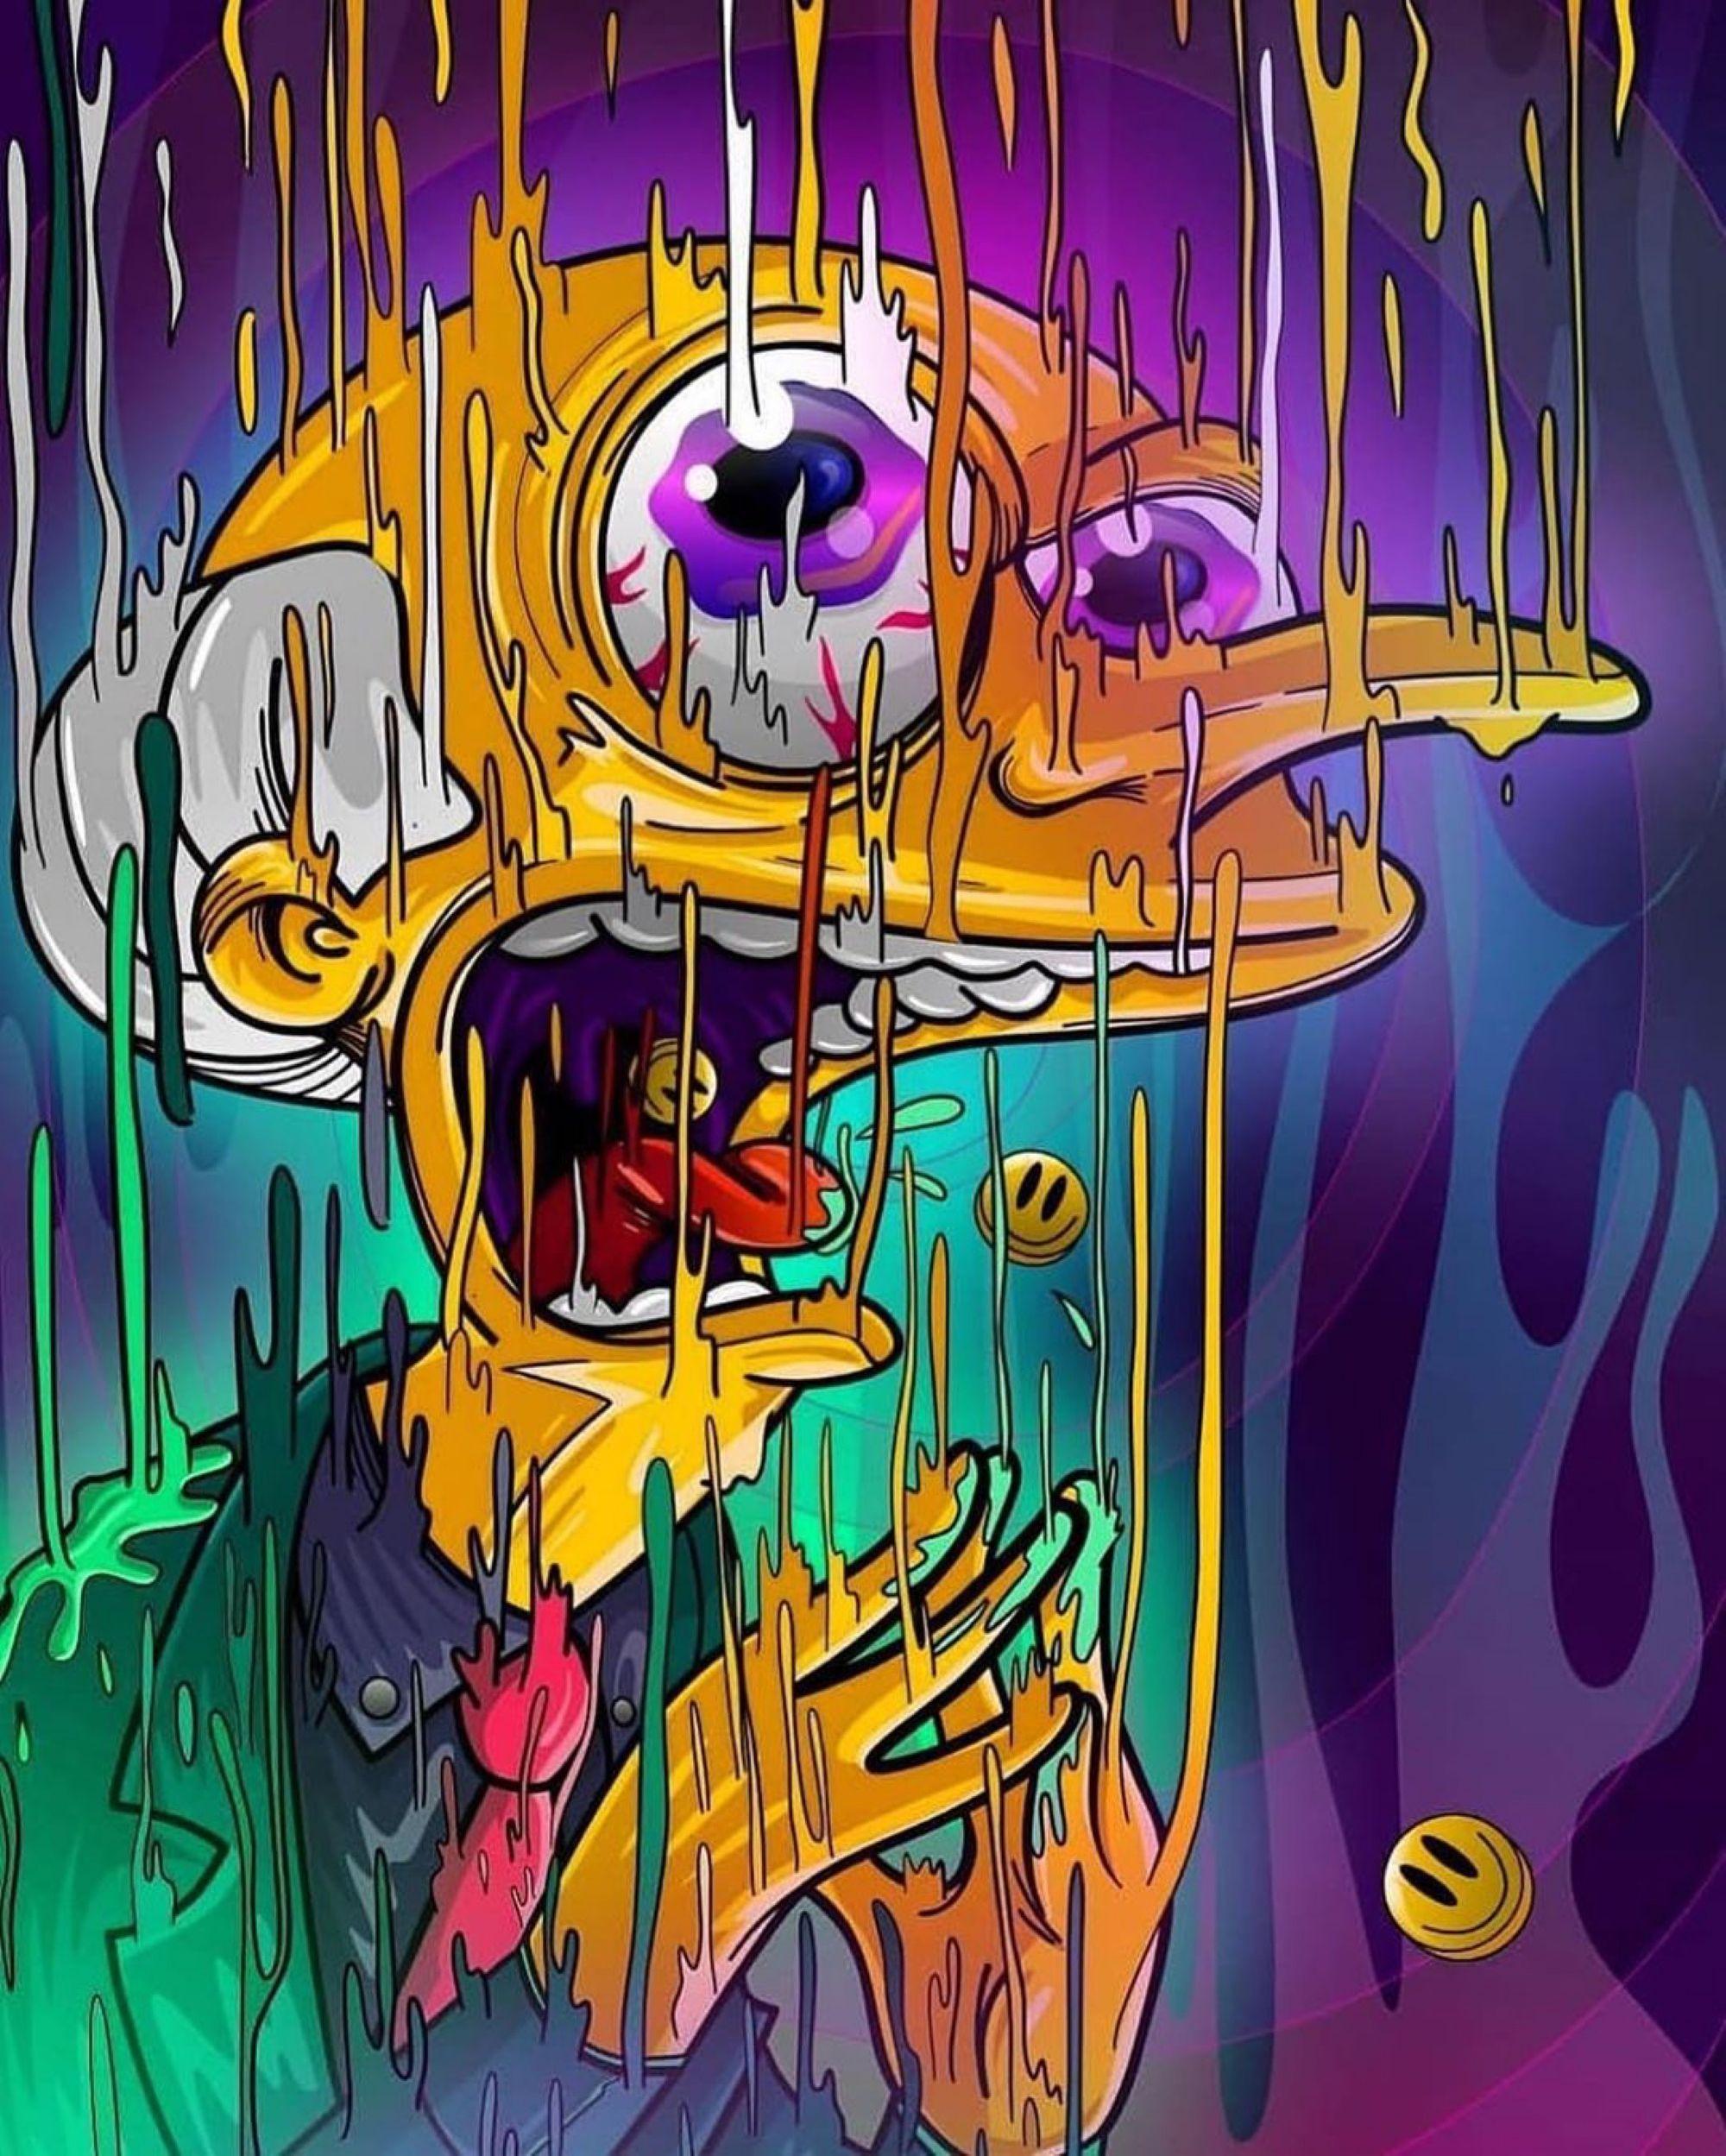 Bart Simpson Trippy Wallpaper : simpson, trippy, wallpaper, Camilo, Oyarzo, Iphone, Simpsons, Simpson, Drawings